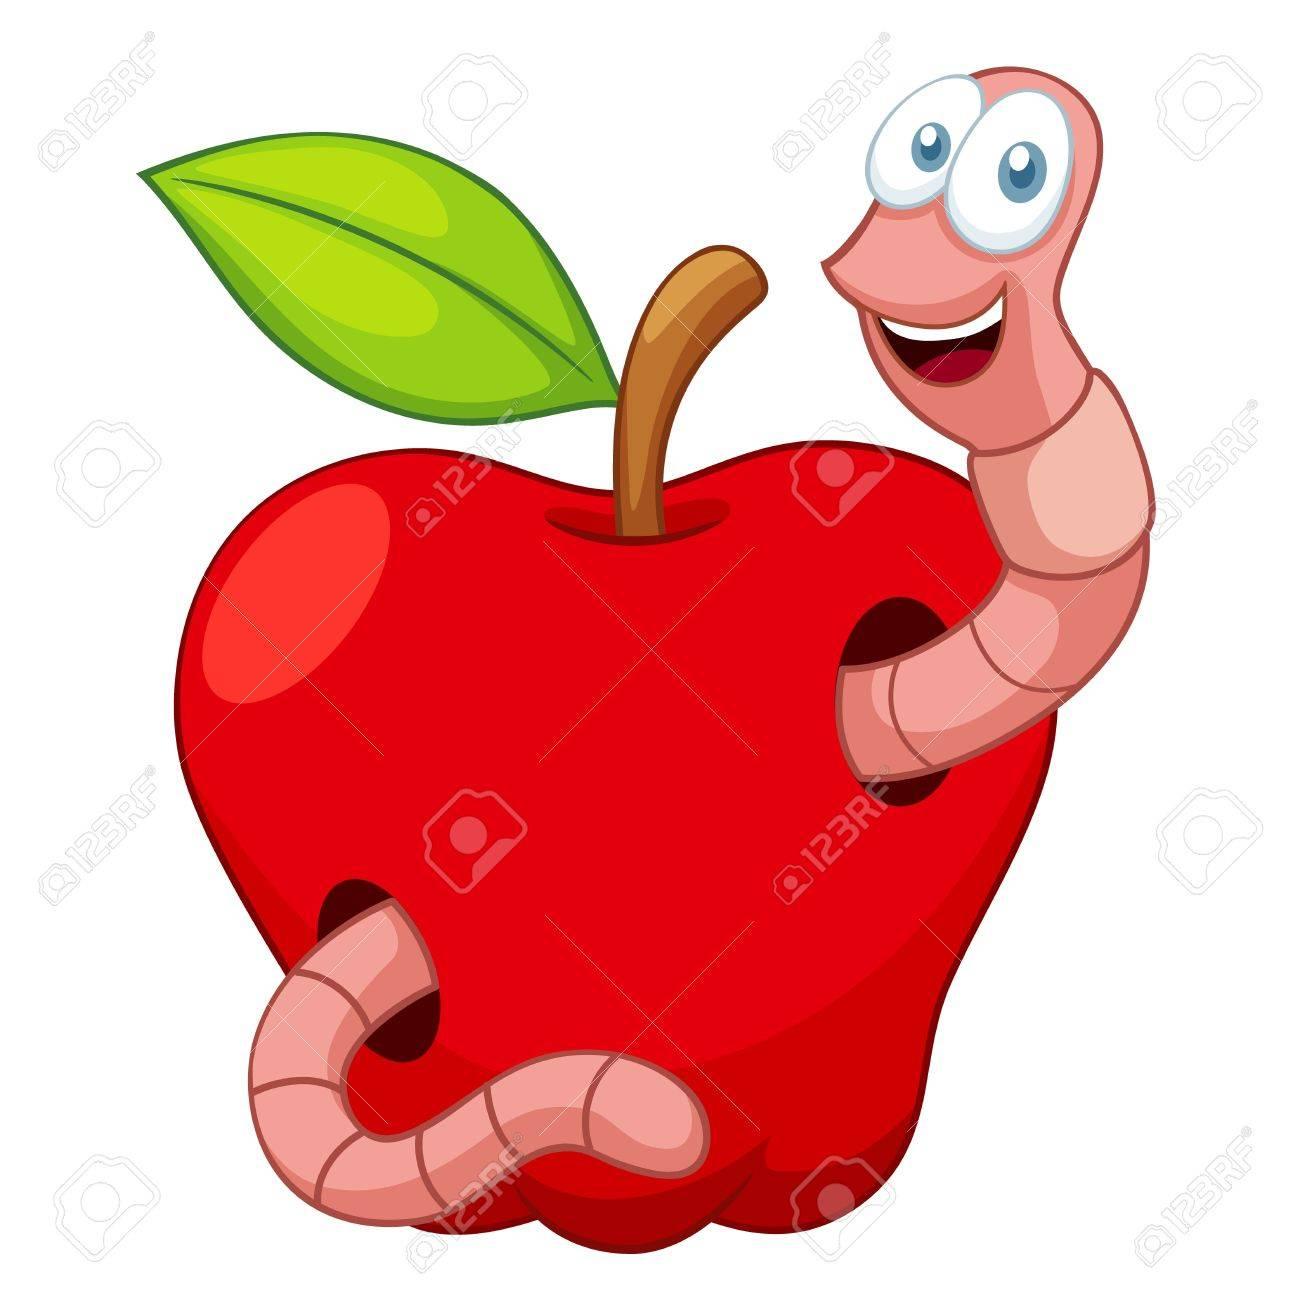 illustration of Cartoon Worm In Apple Stock Vector - 16772028